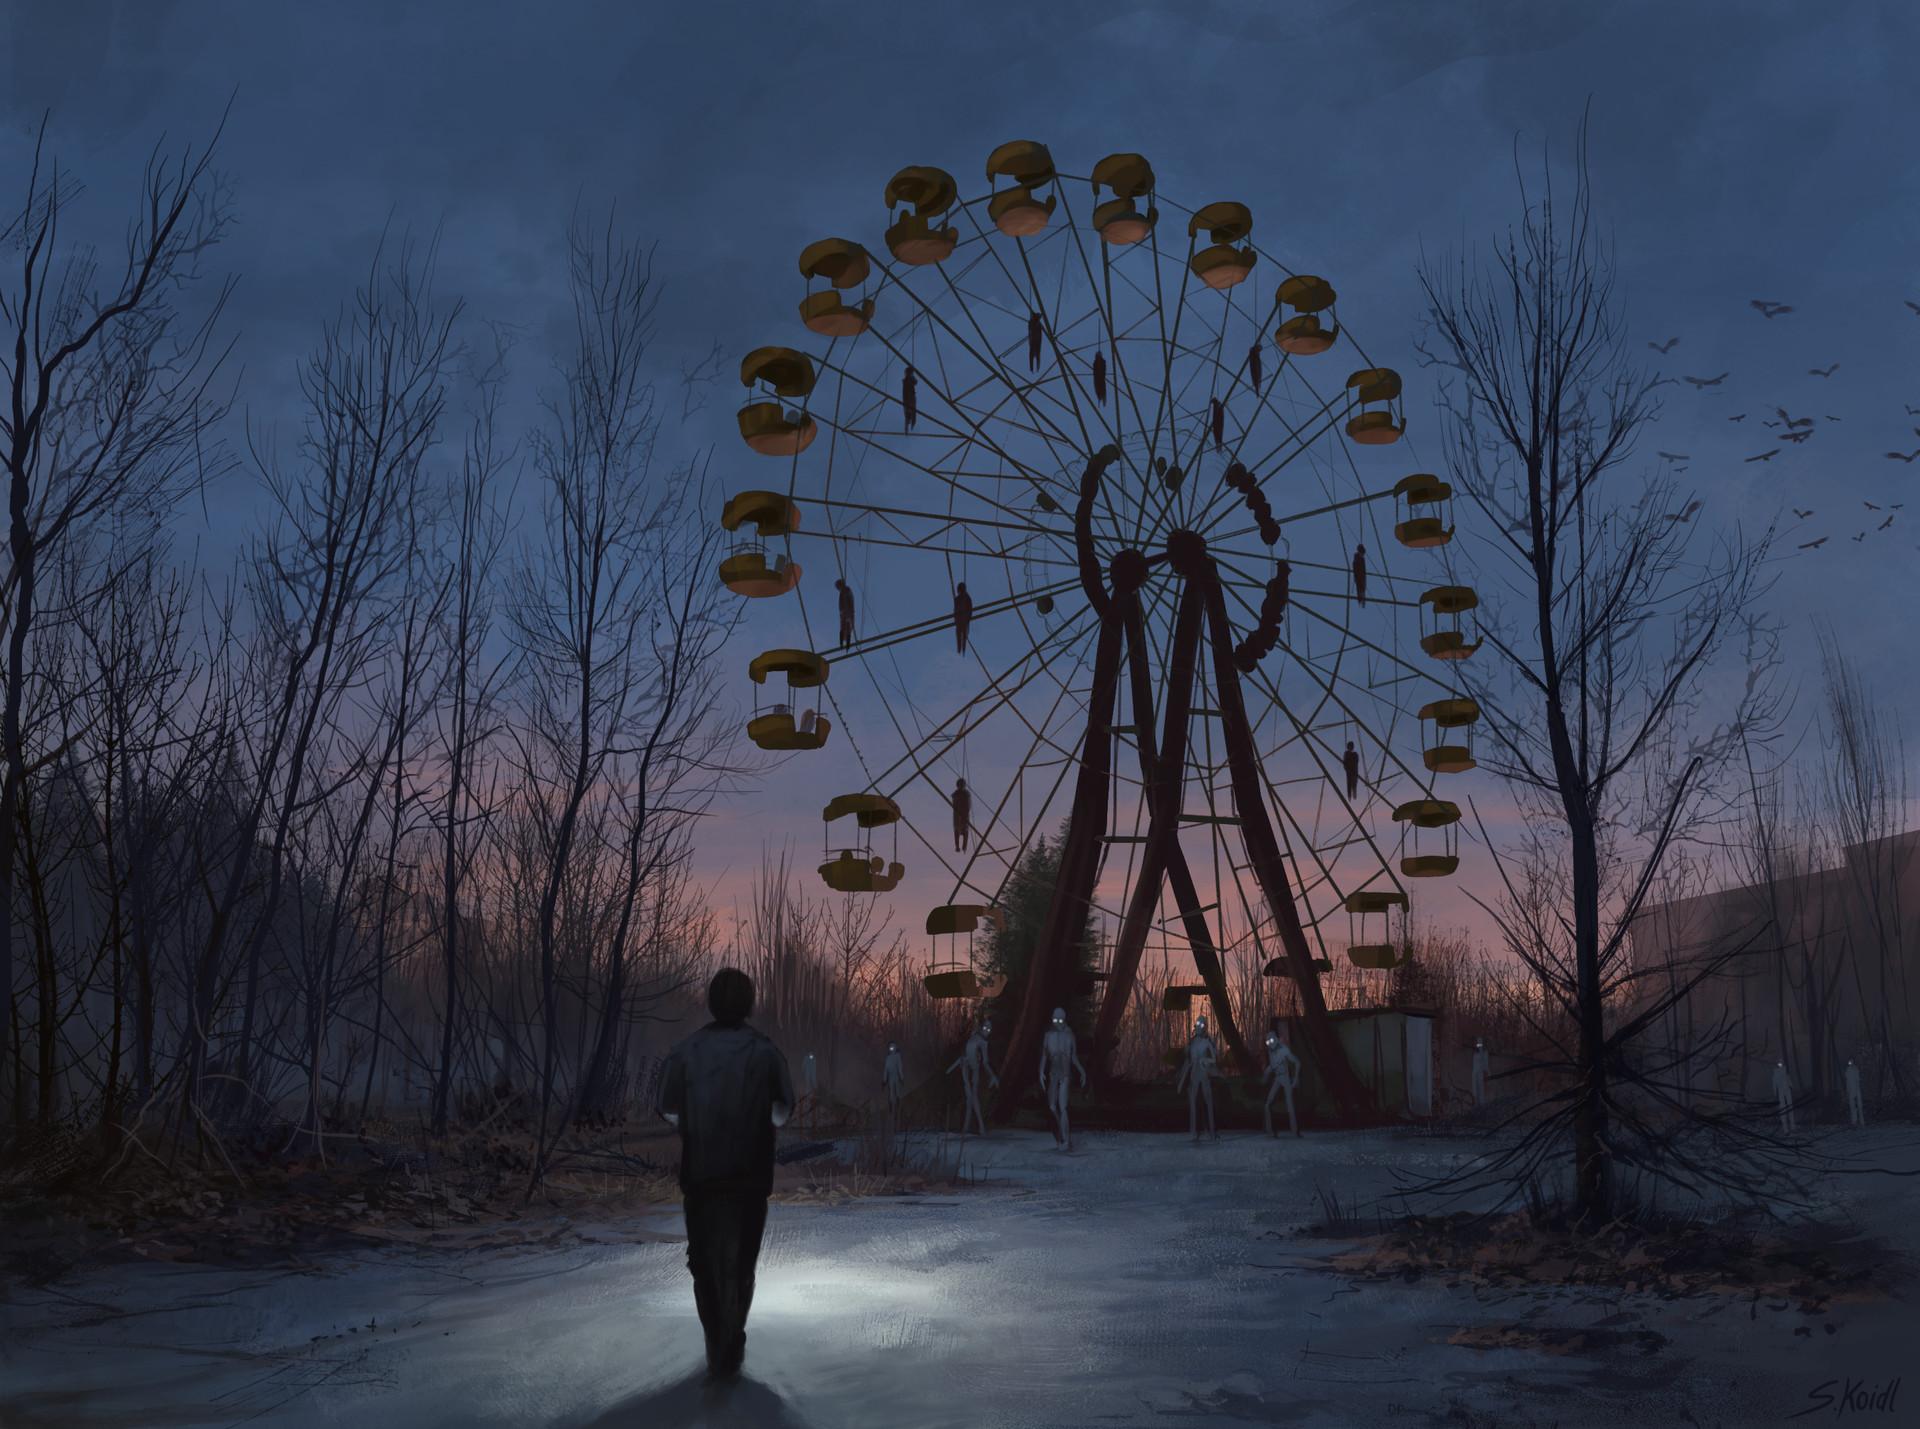 A Chernobyl Horror Story 9